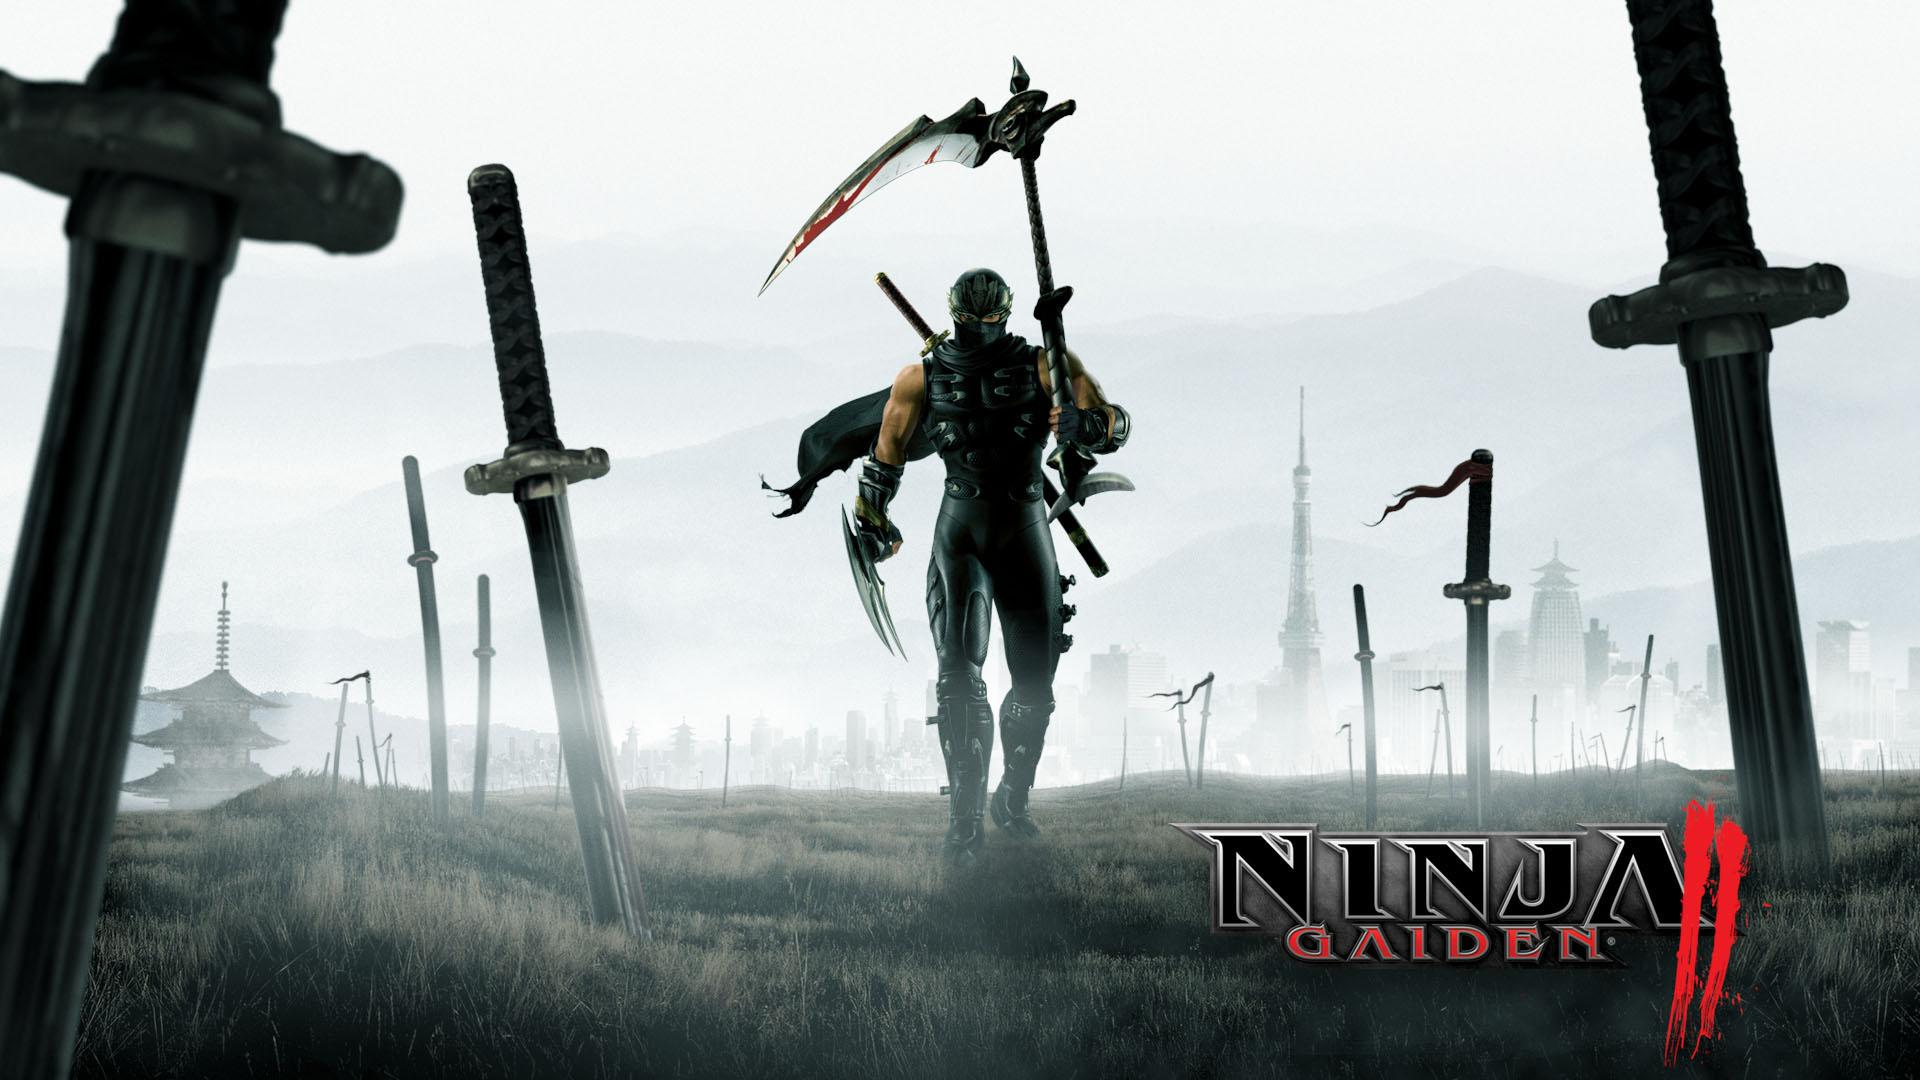 57686_ninja-gaiden-ii.jpg (1920×1080)